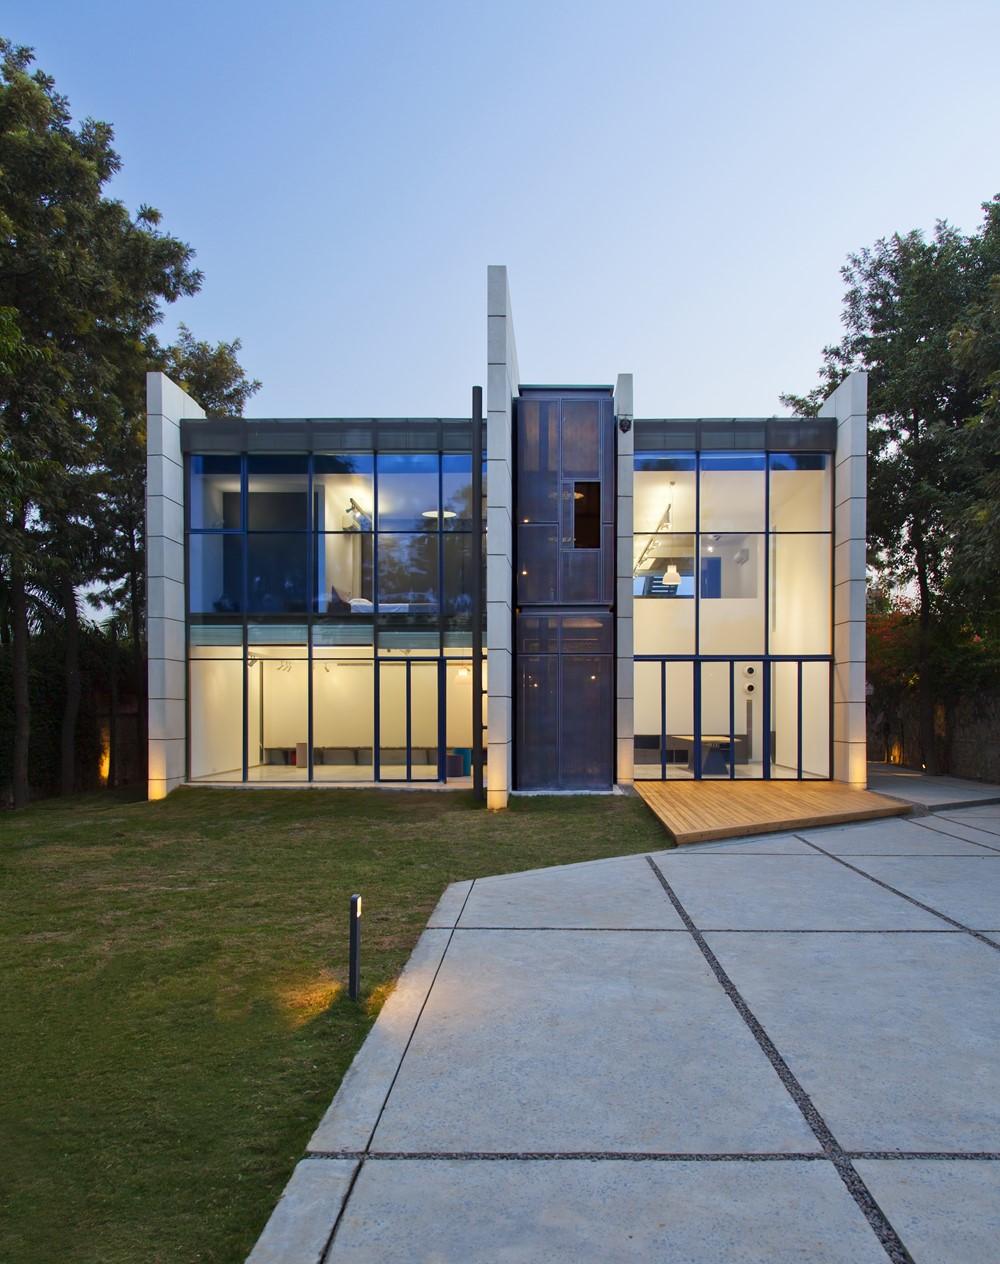 B23 by Architecture Discipline